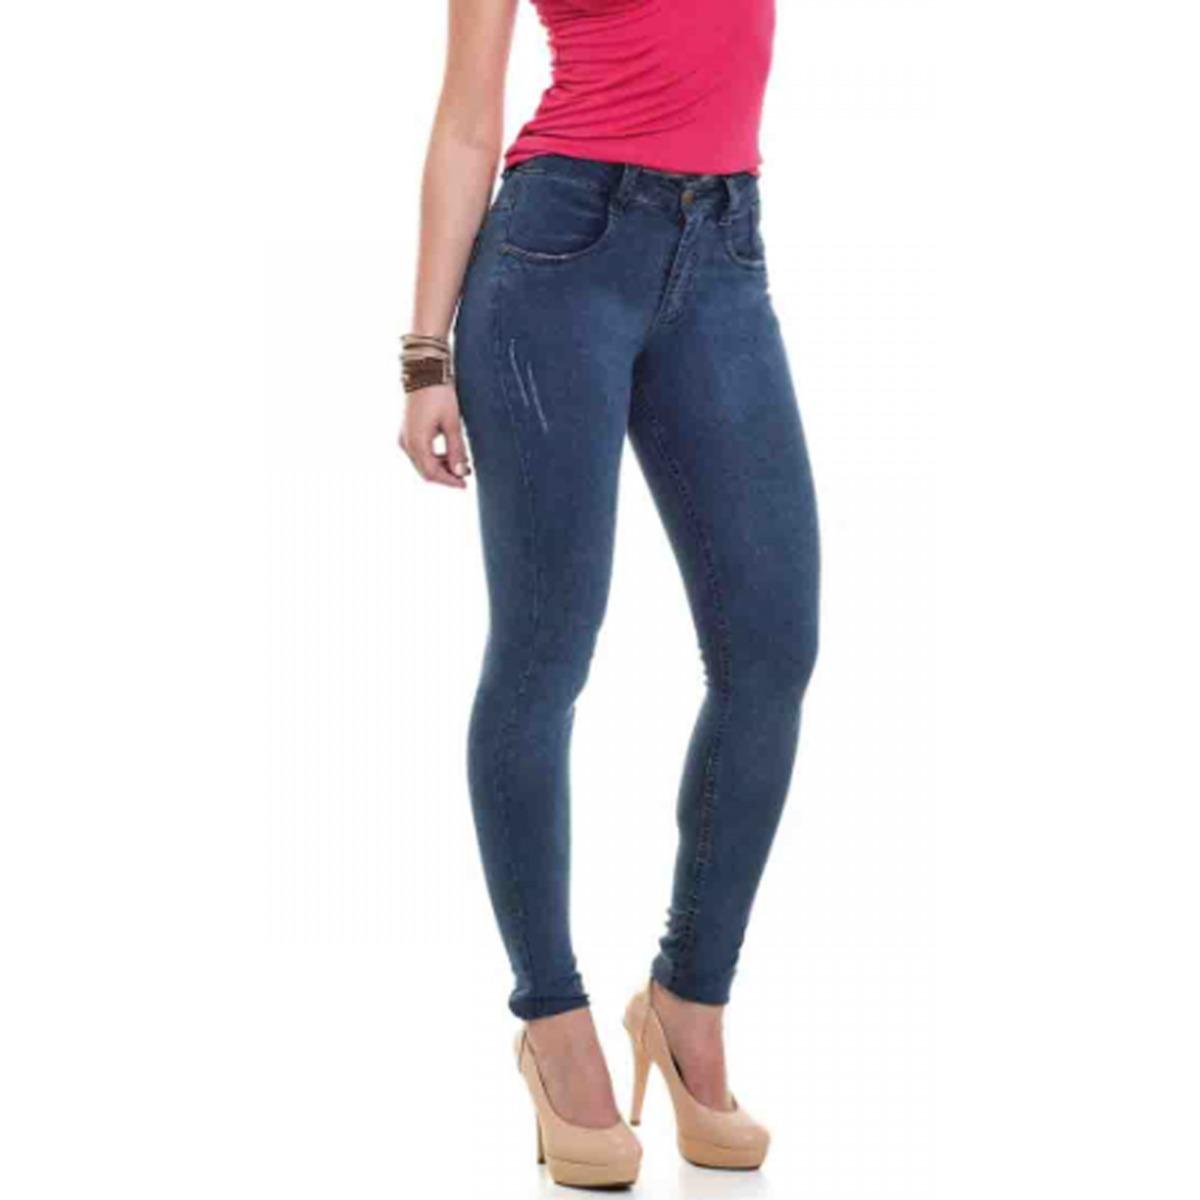 34957093c4 kit 4 calça jeans feminina cintura plus size atacado c lycra. Carregando  zoom.